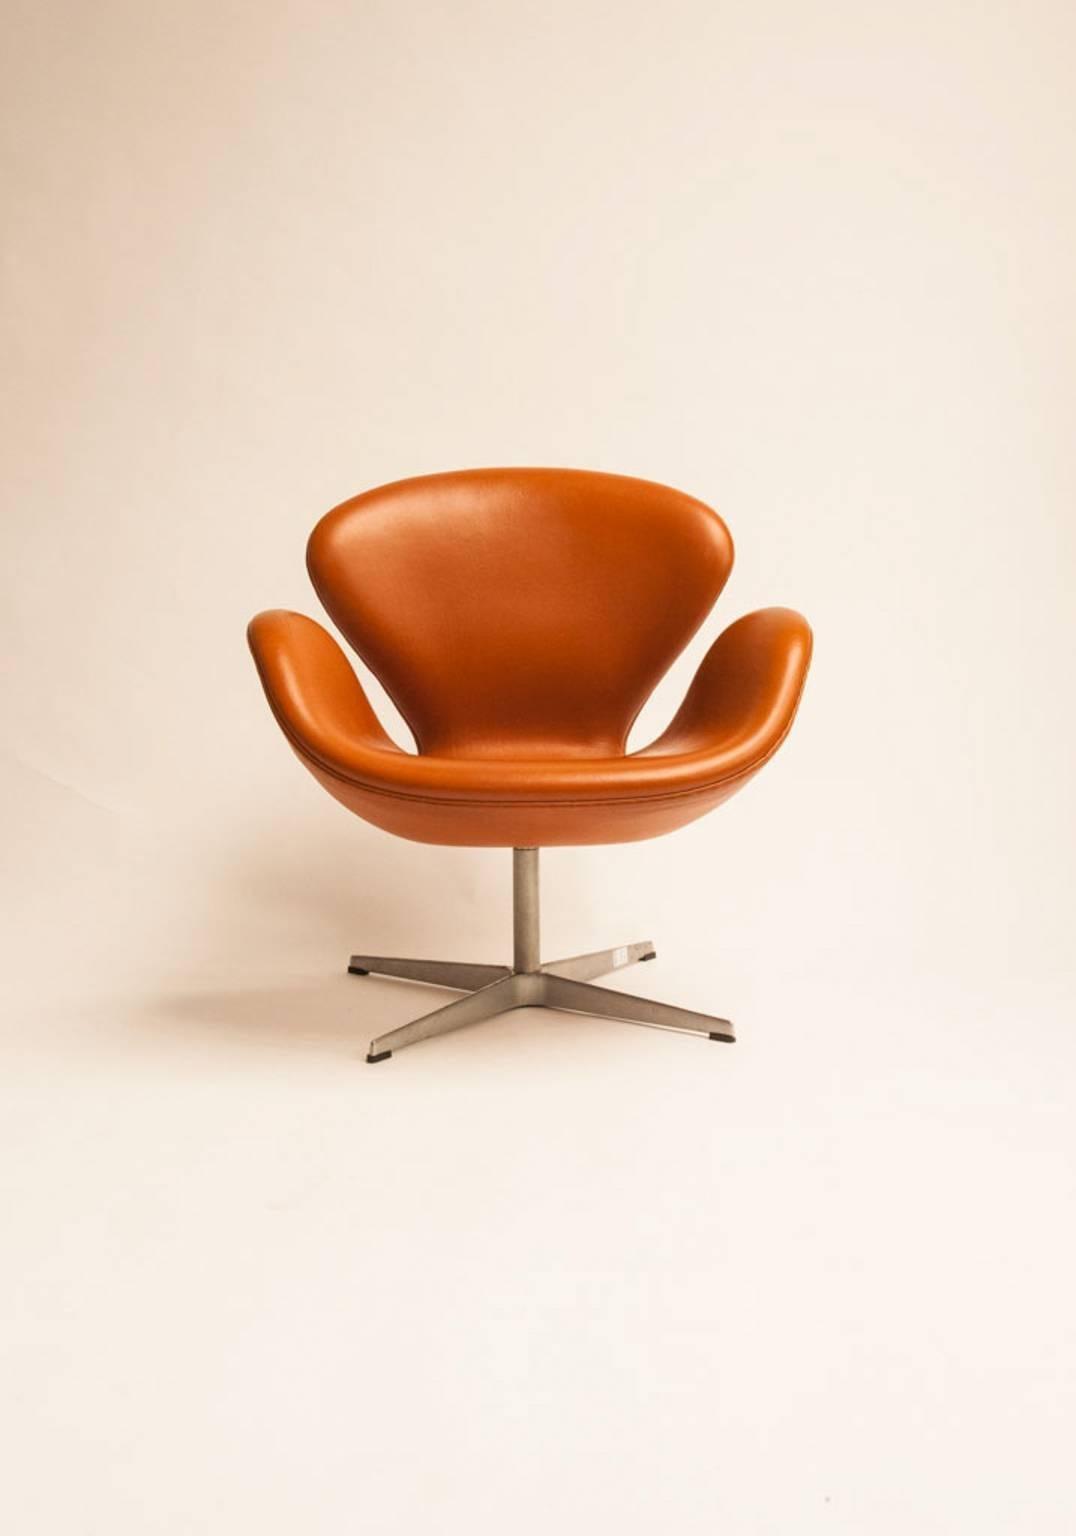 arne jacobsen swan chair vs stool by for sale at 1stdibs scandinavian modern